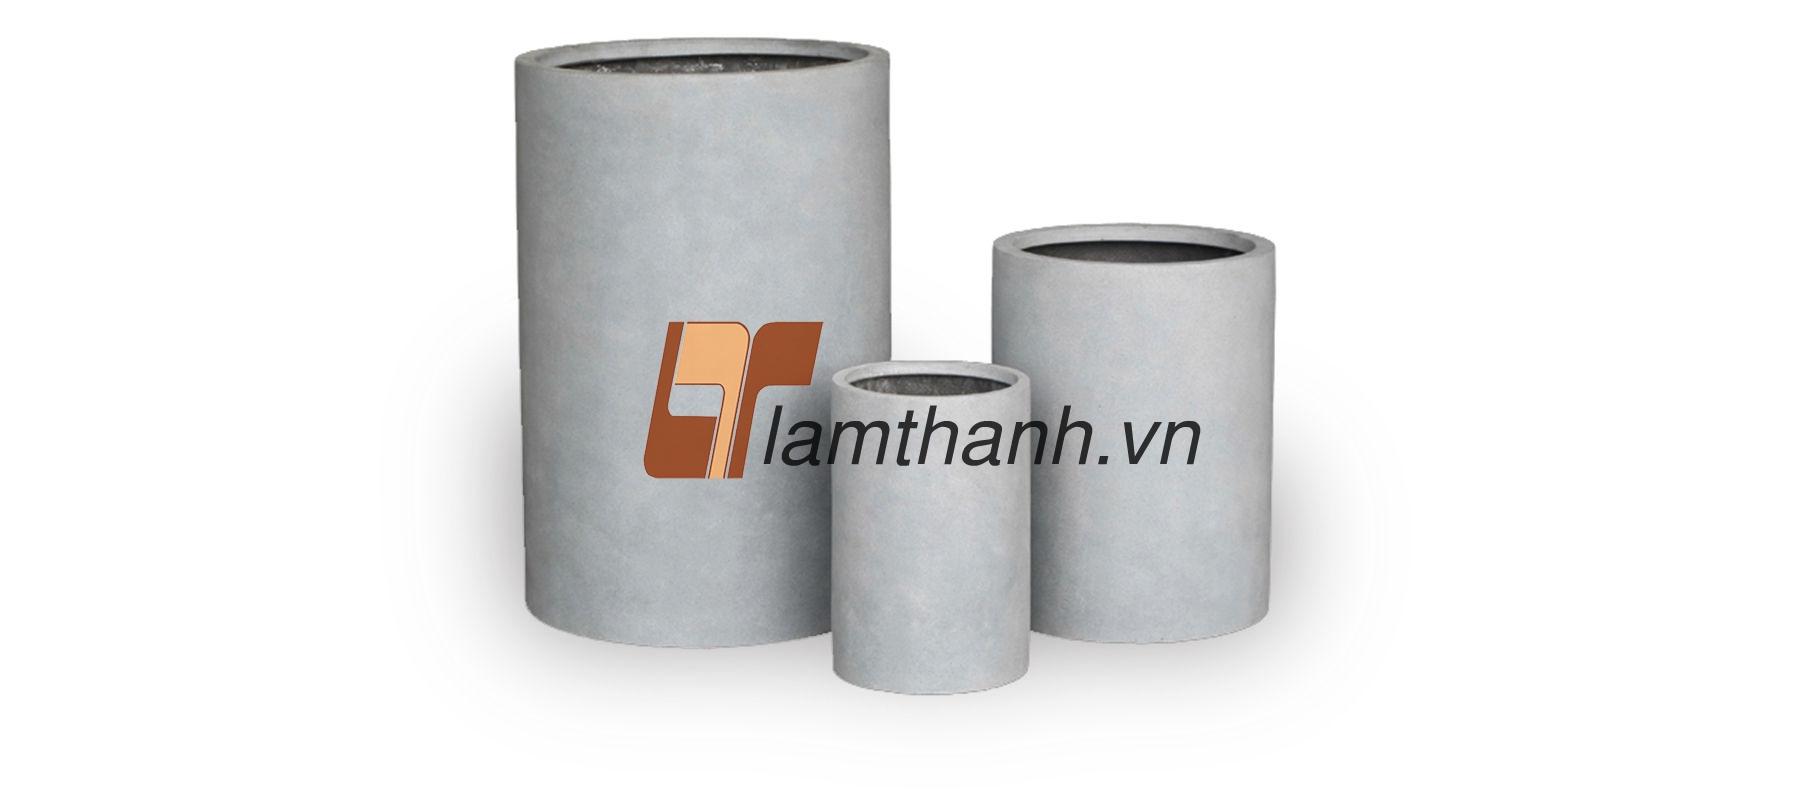 vietnam polystone, fiberstone 04